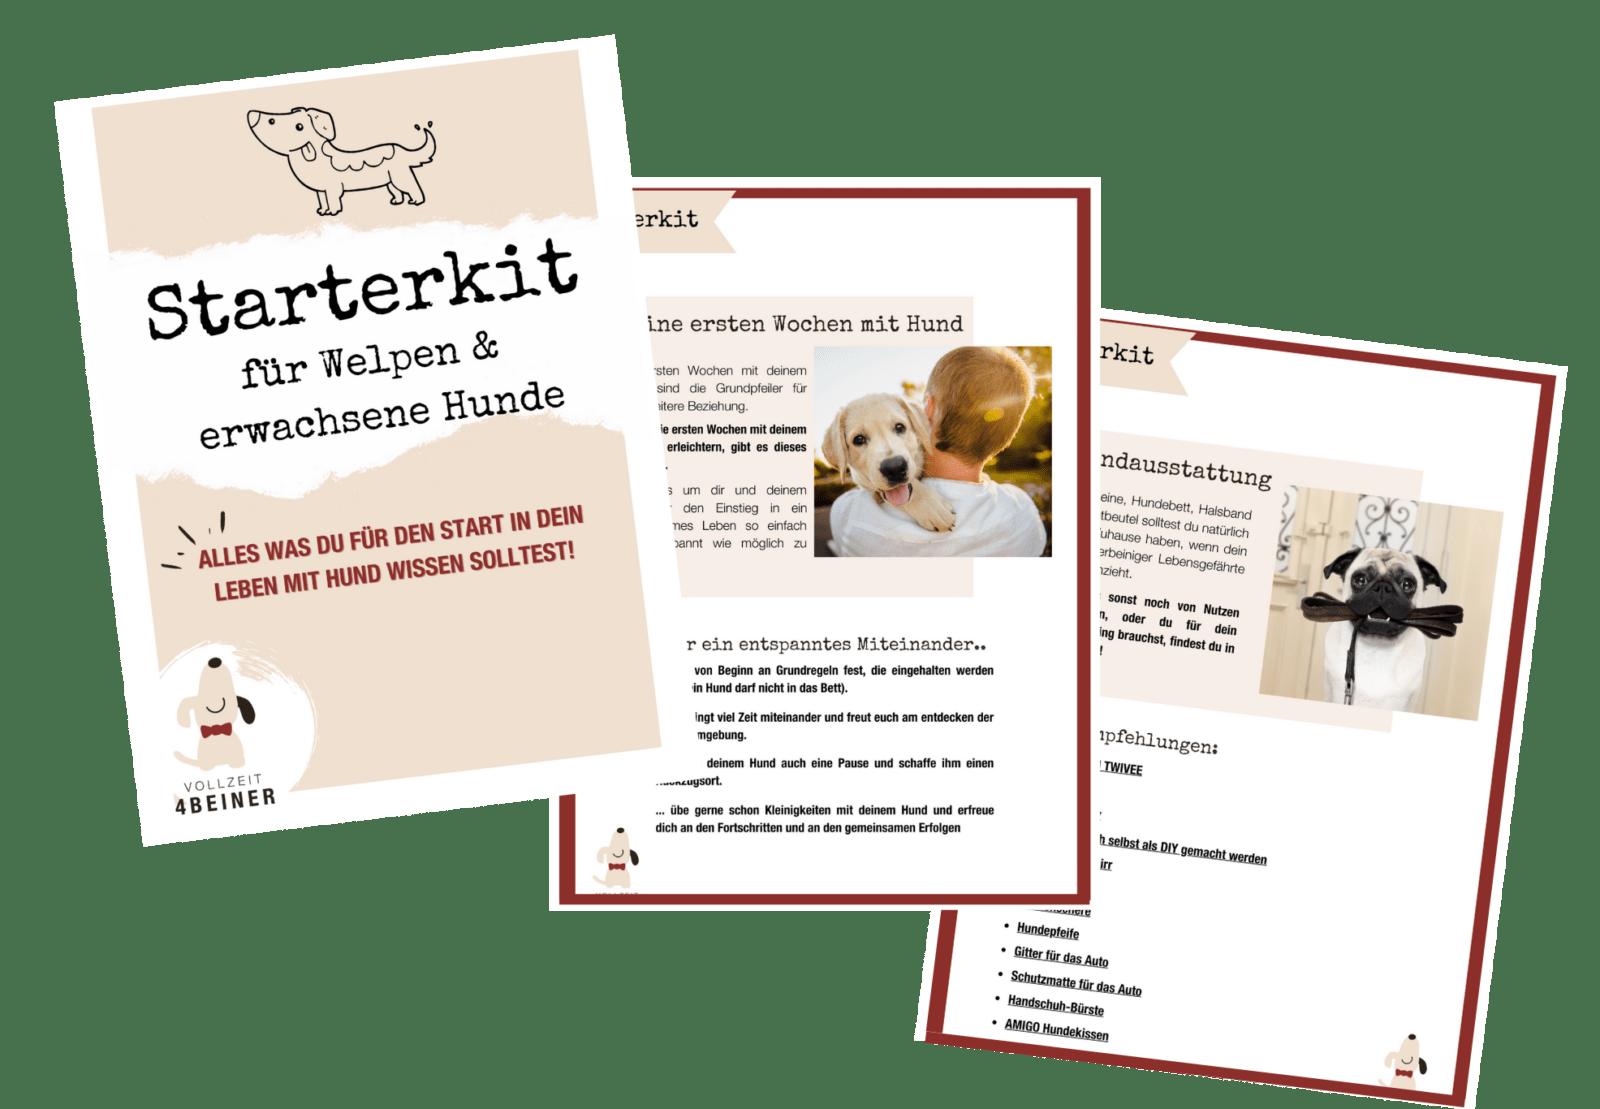 starterkit-welpen-gratis-kostenlos-hunde-hundeschule